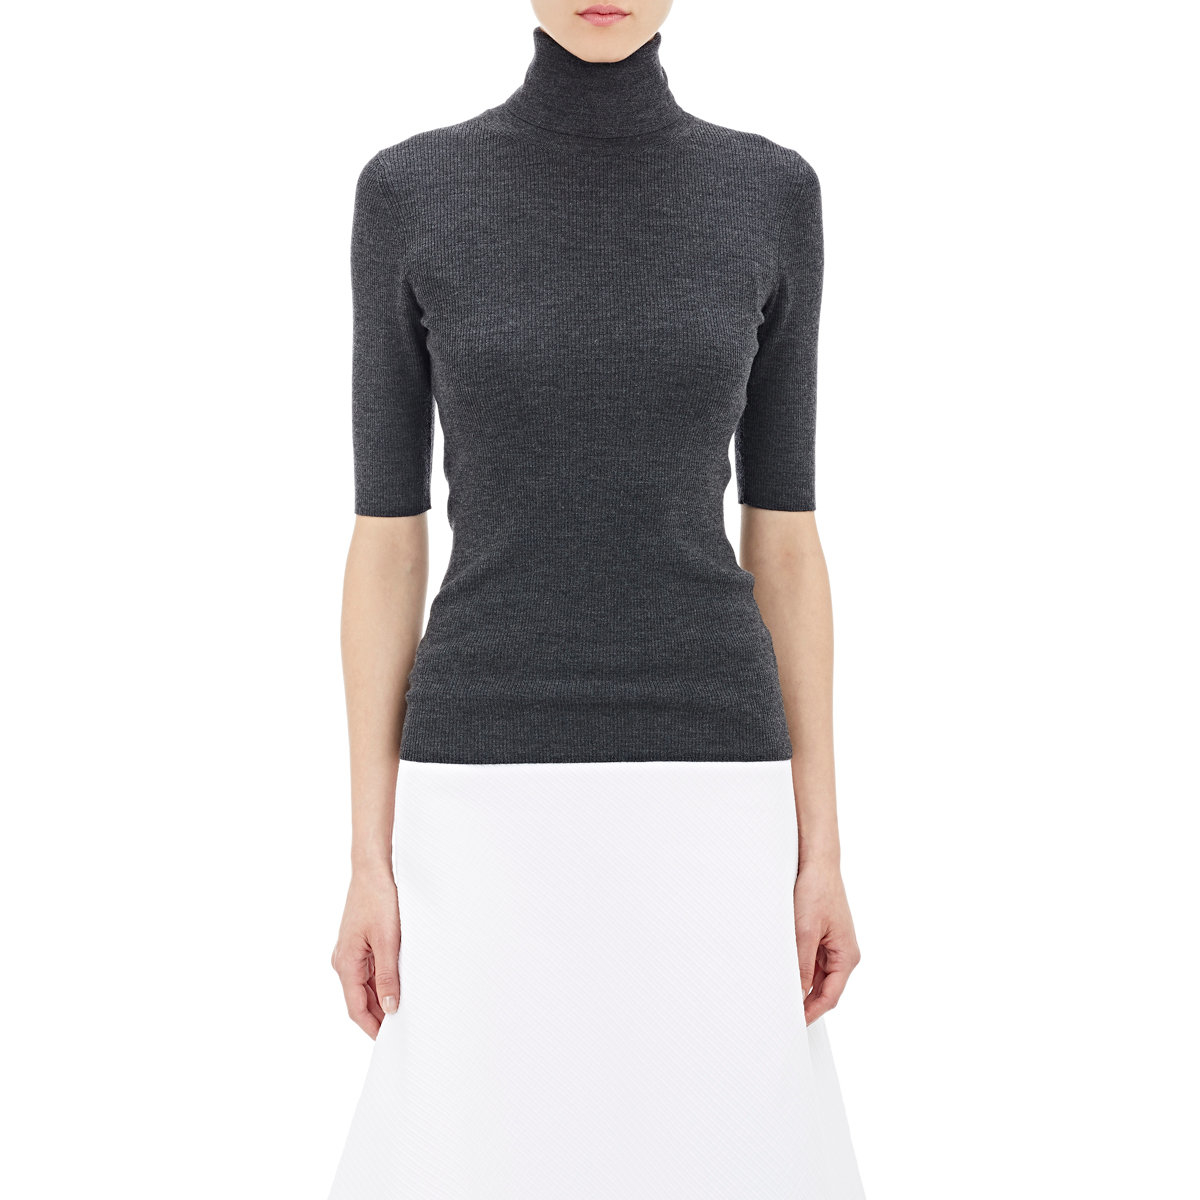 53d51e8e74d6f Lyst - Theory Leenda Turtleneck Short-sleeve Sweater in Black